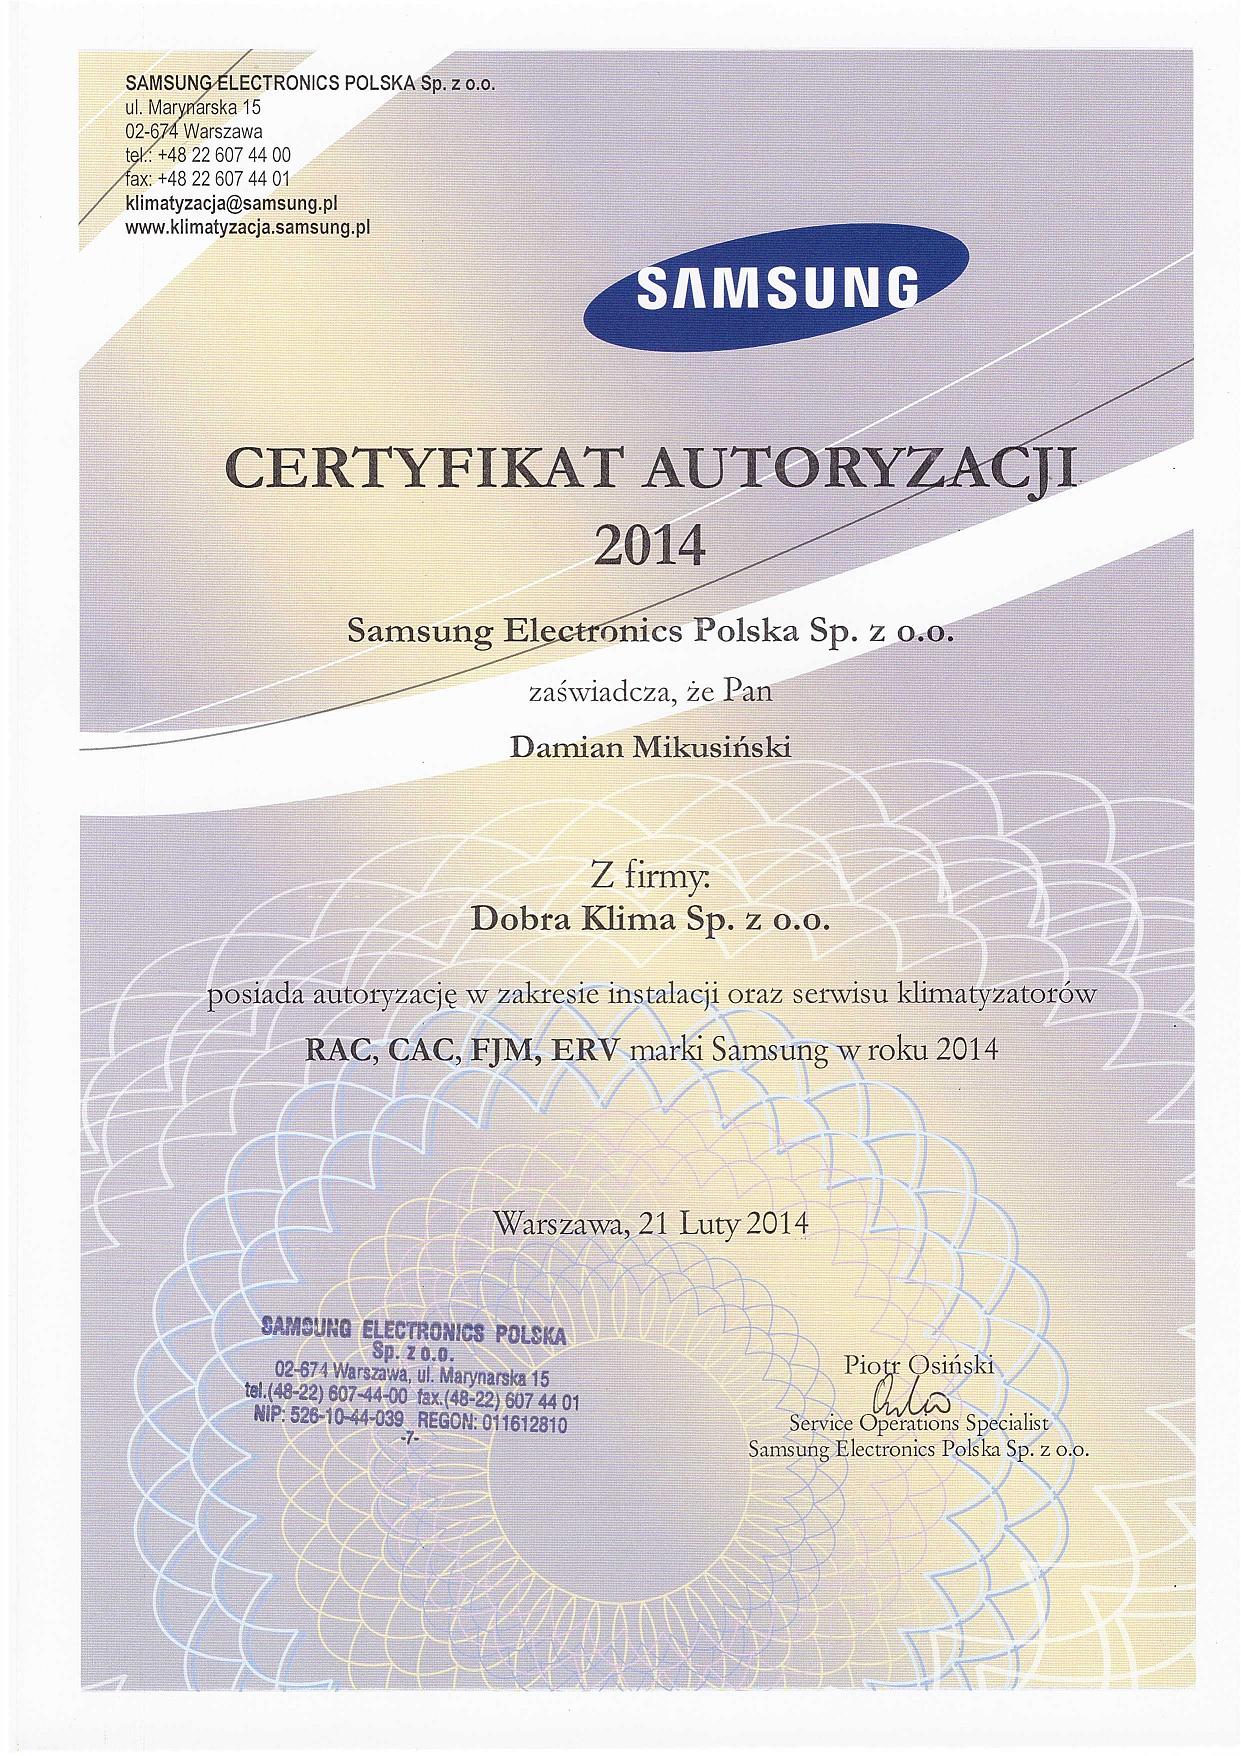 2014-certyfikat-samsung-damian-mikusinski